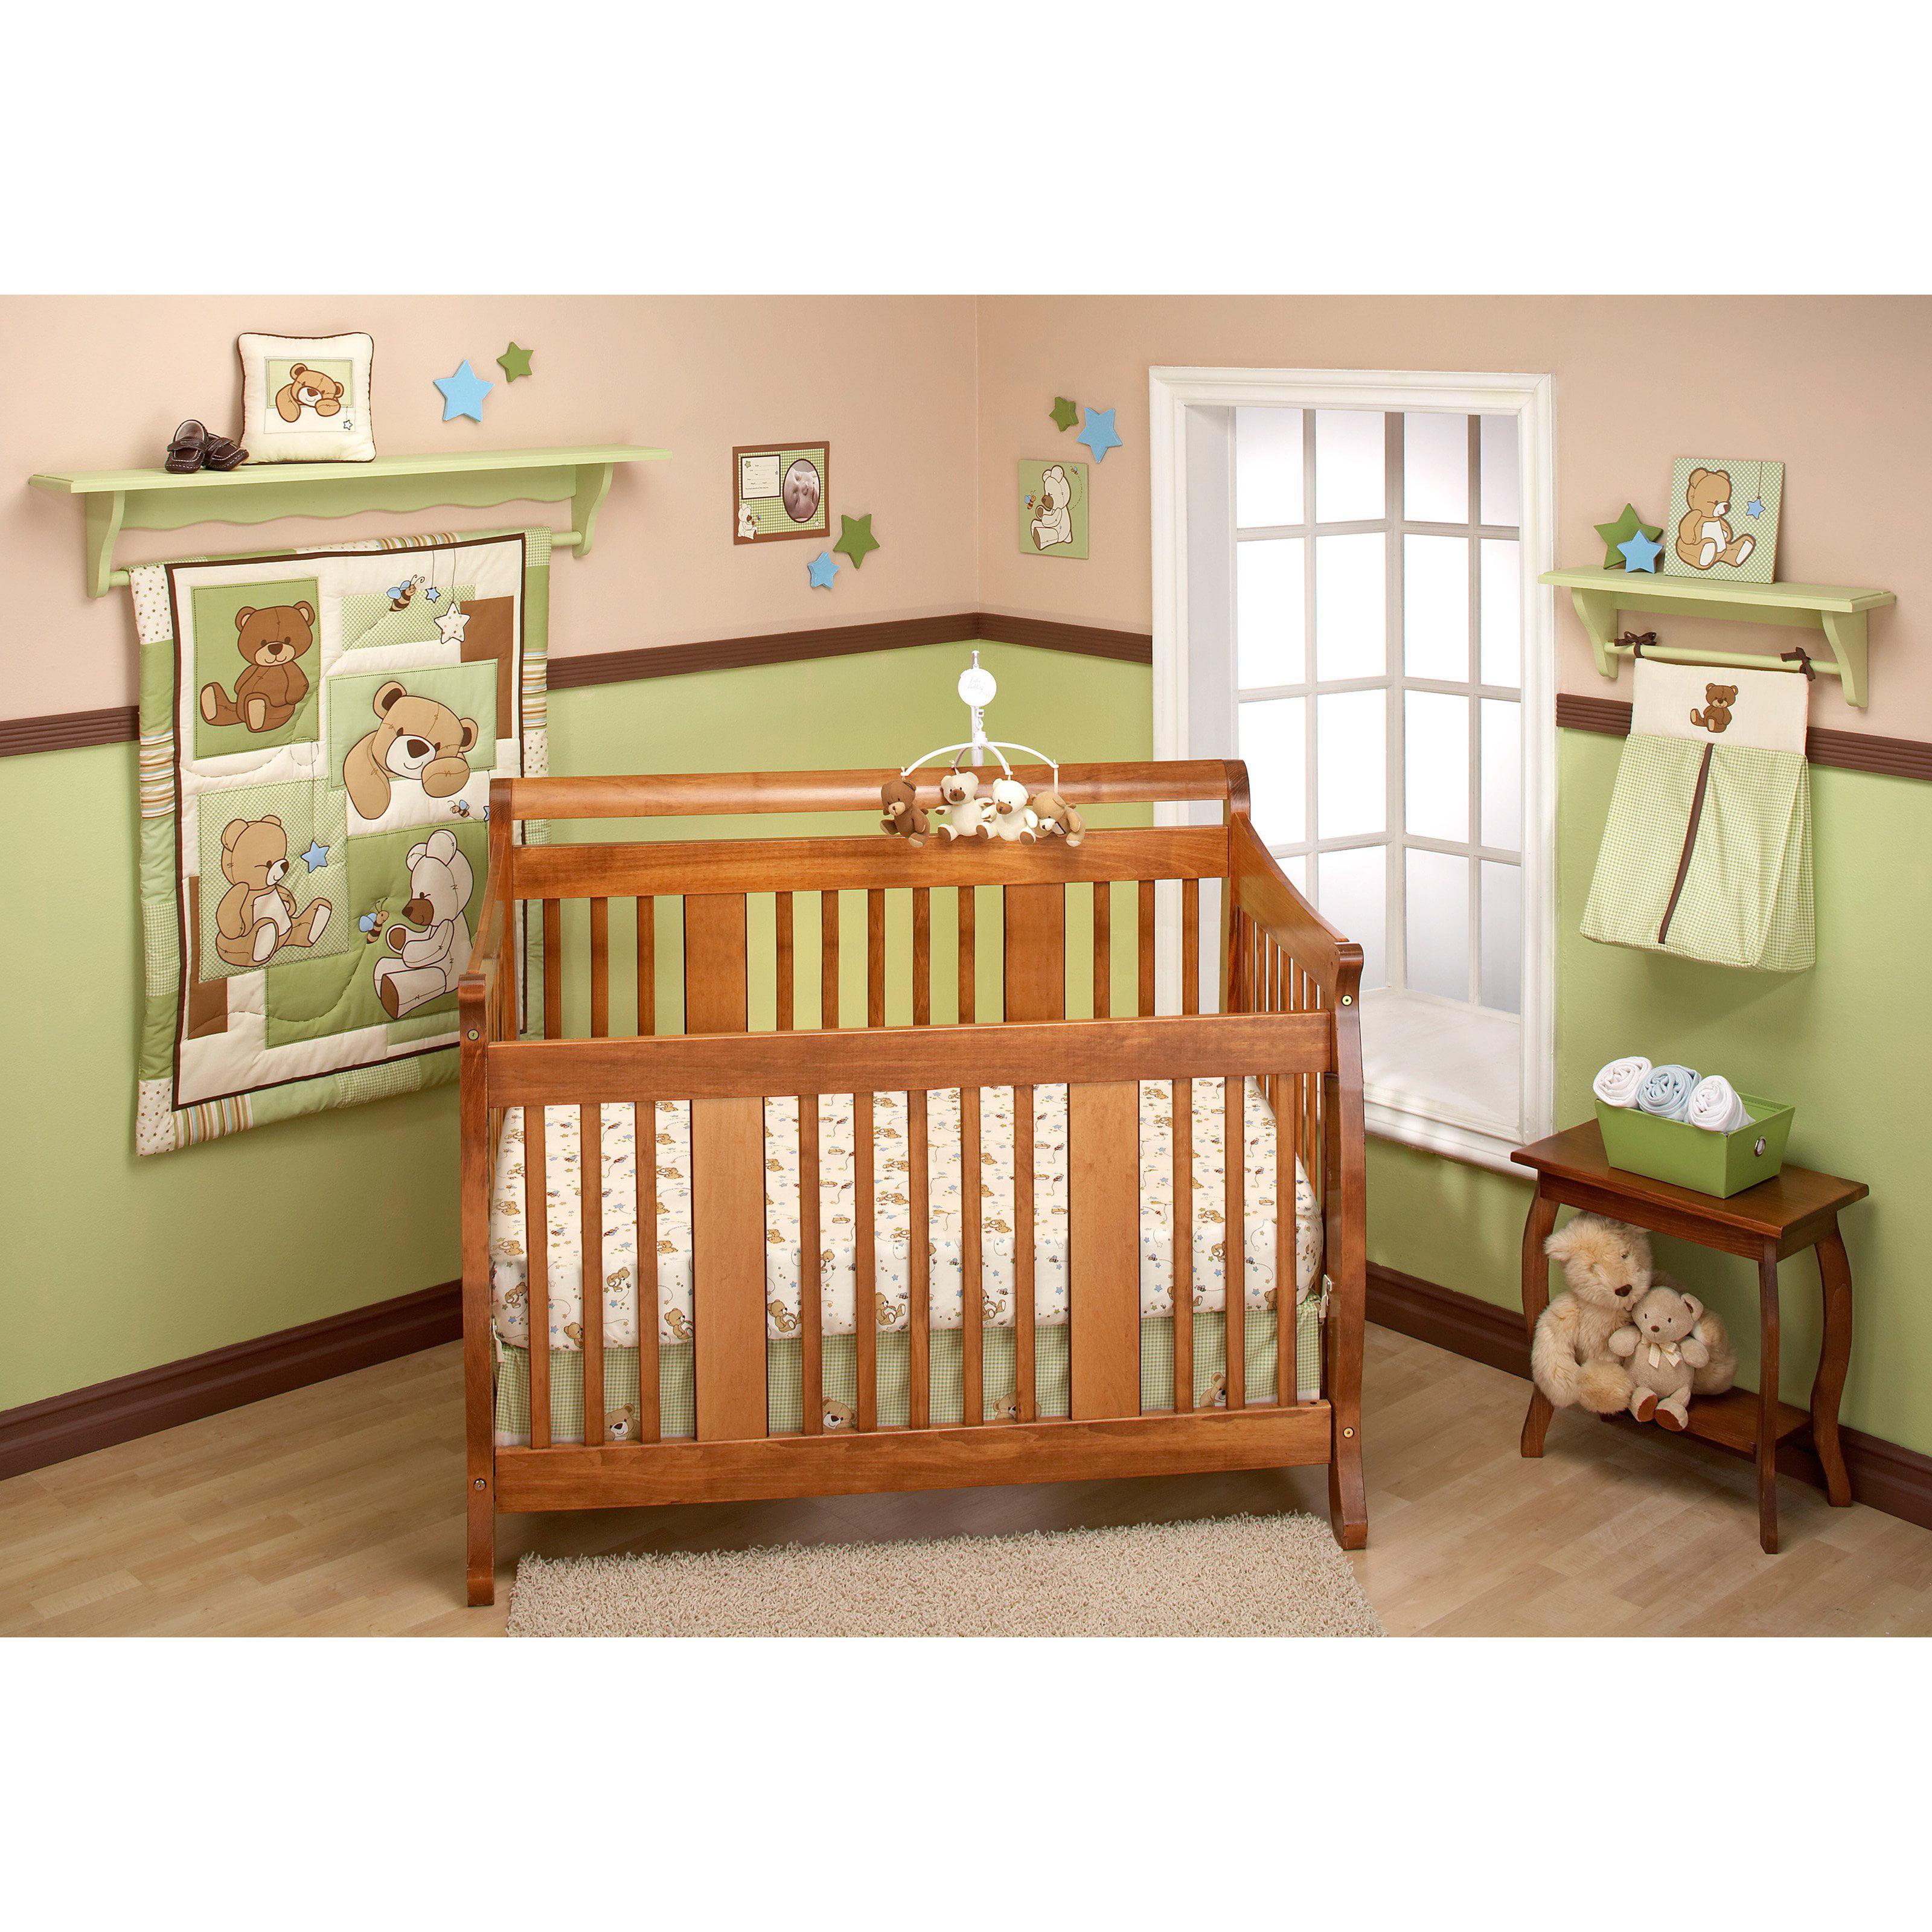 Little Bedding by NoJo Dream Land Teddy Unisex Crib Set